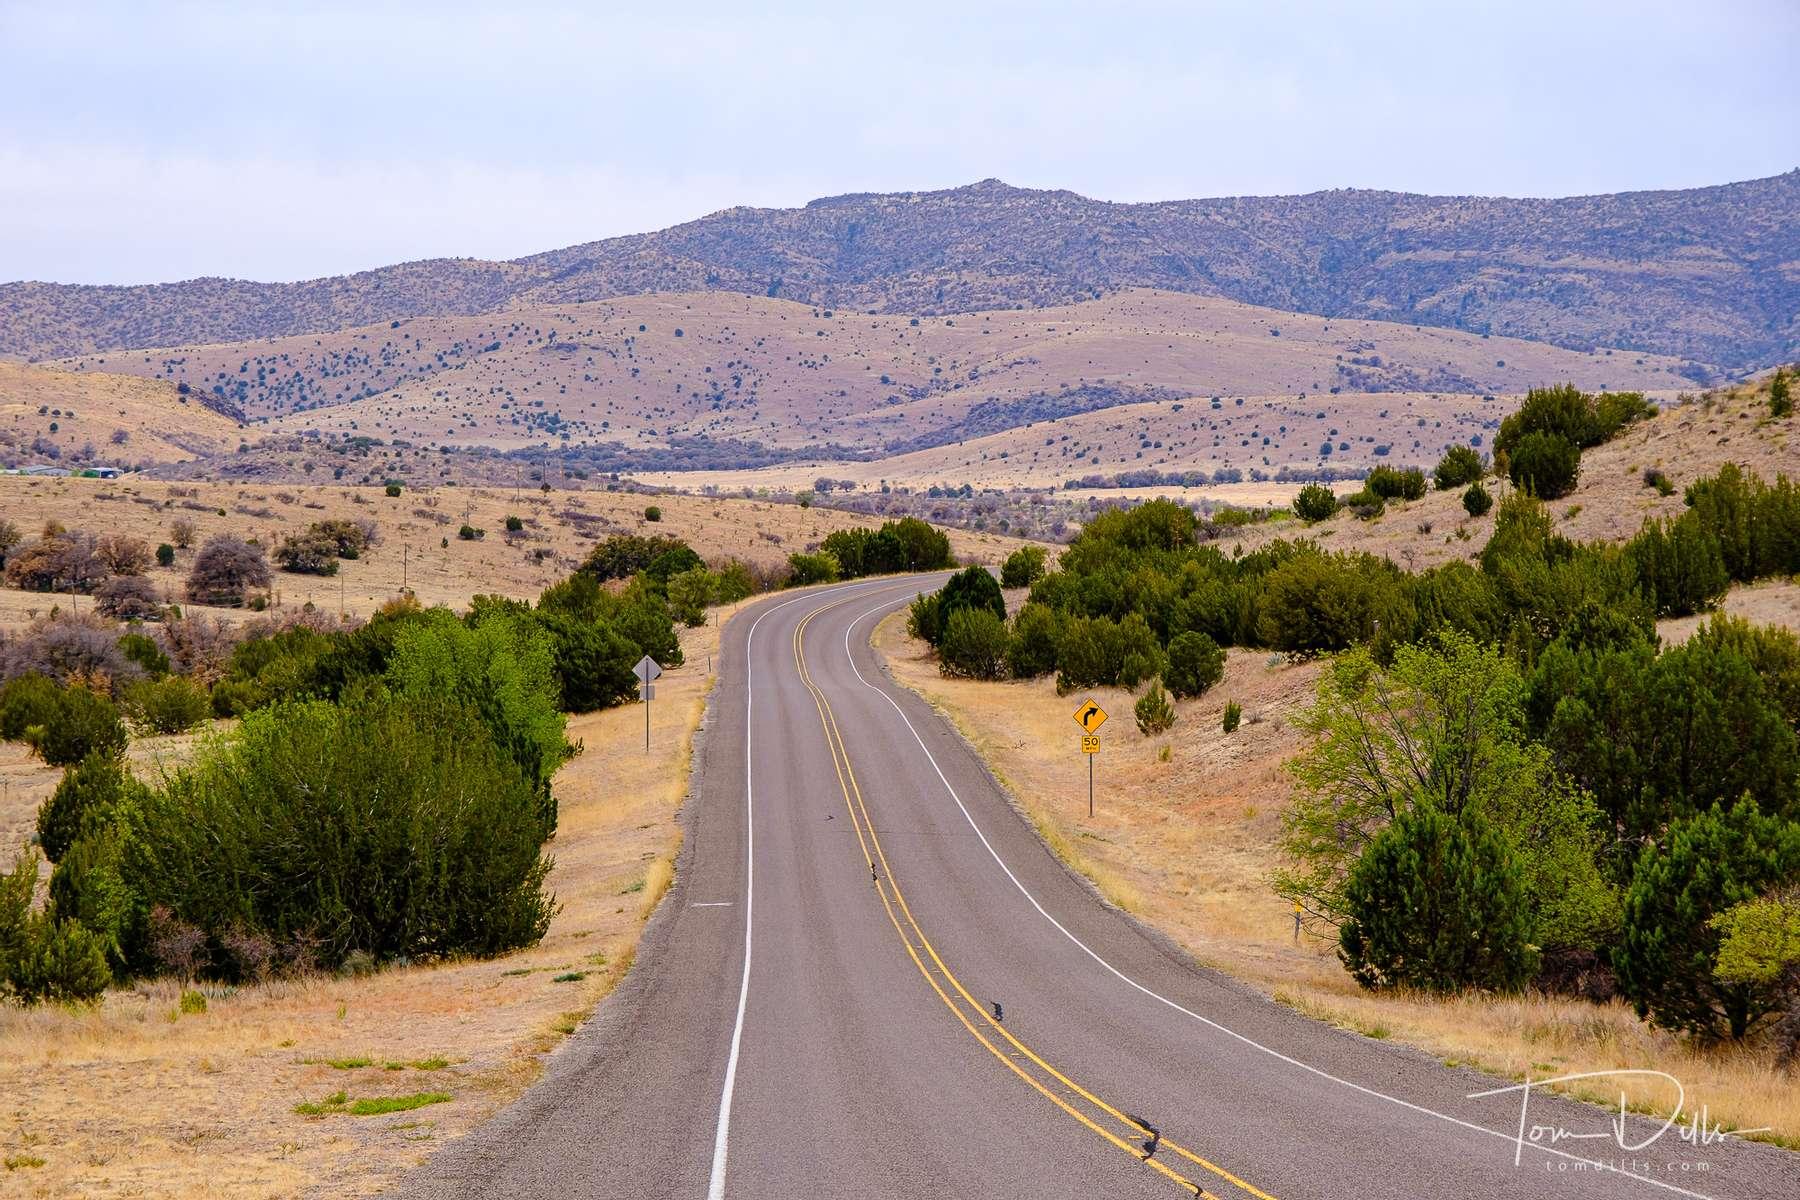 Scenery along SR-118 enroute to McDonald Observatory near Fort Davis, Texas